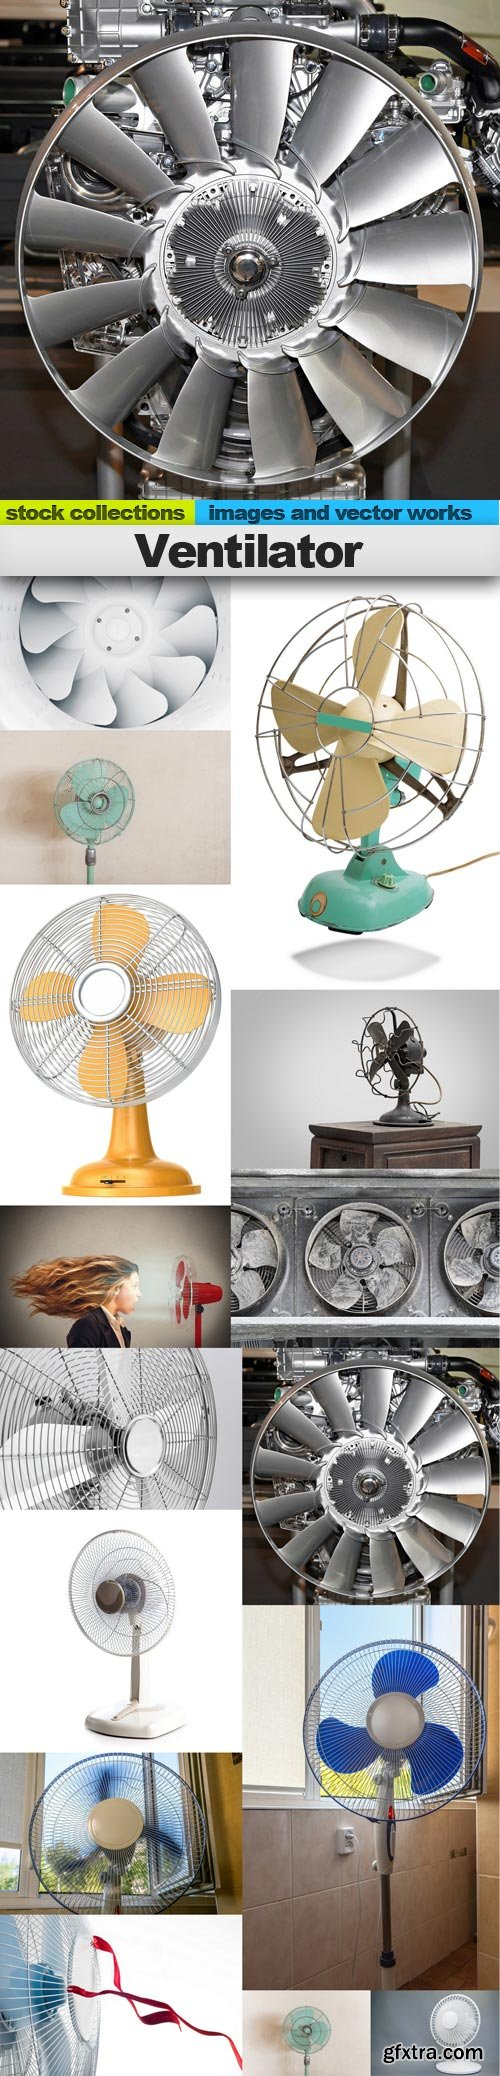 Ventilator, 15 x UHQ JPEG